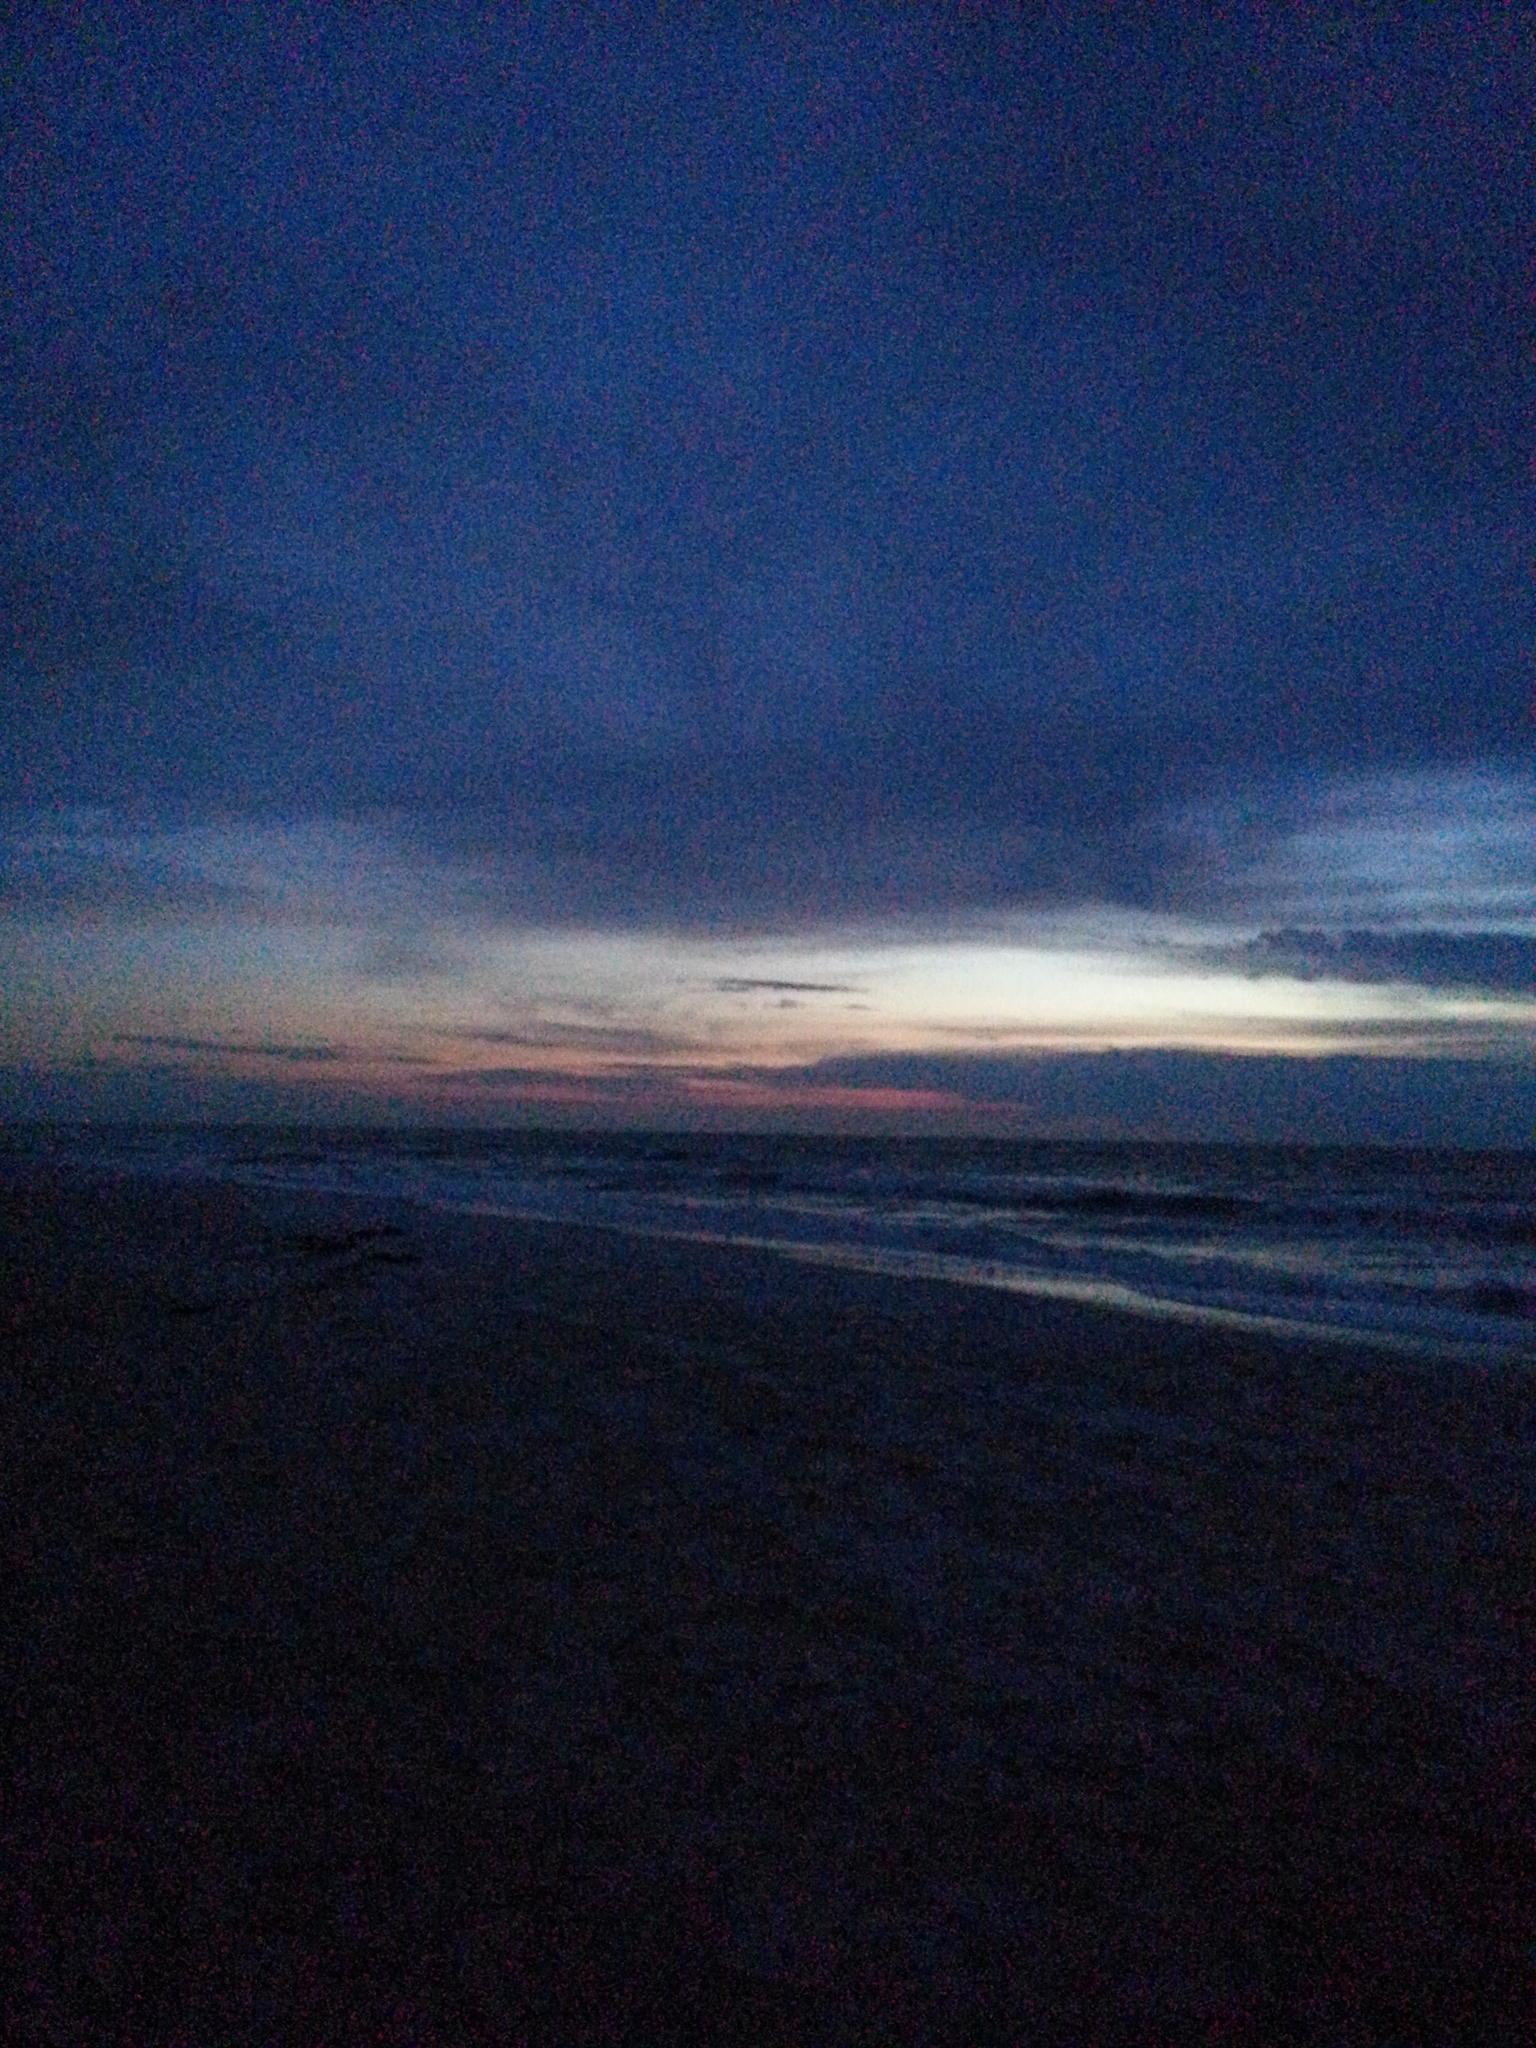 sunset last night by pamela.kanarr